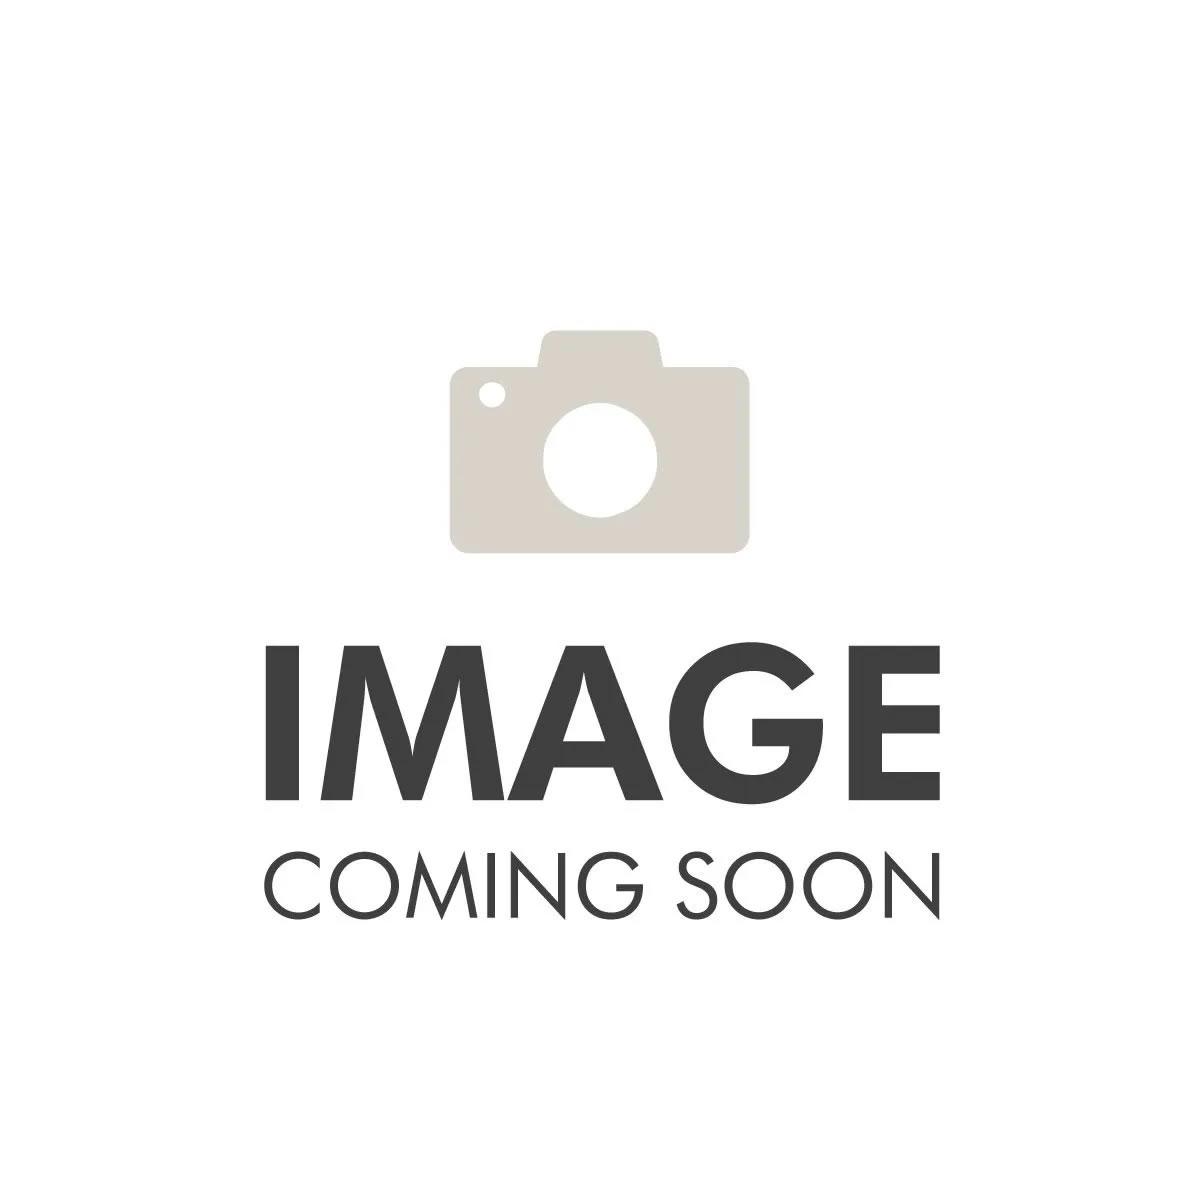 Rock Crawler Front Bumper; 76-06 Jeep CJ/Wrangler YJ/TJ